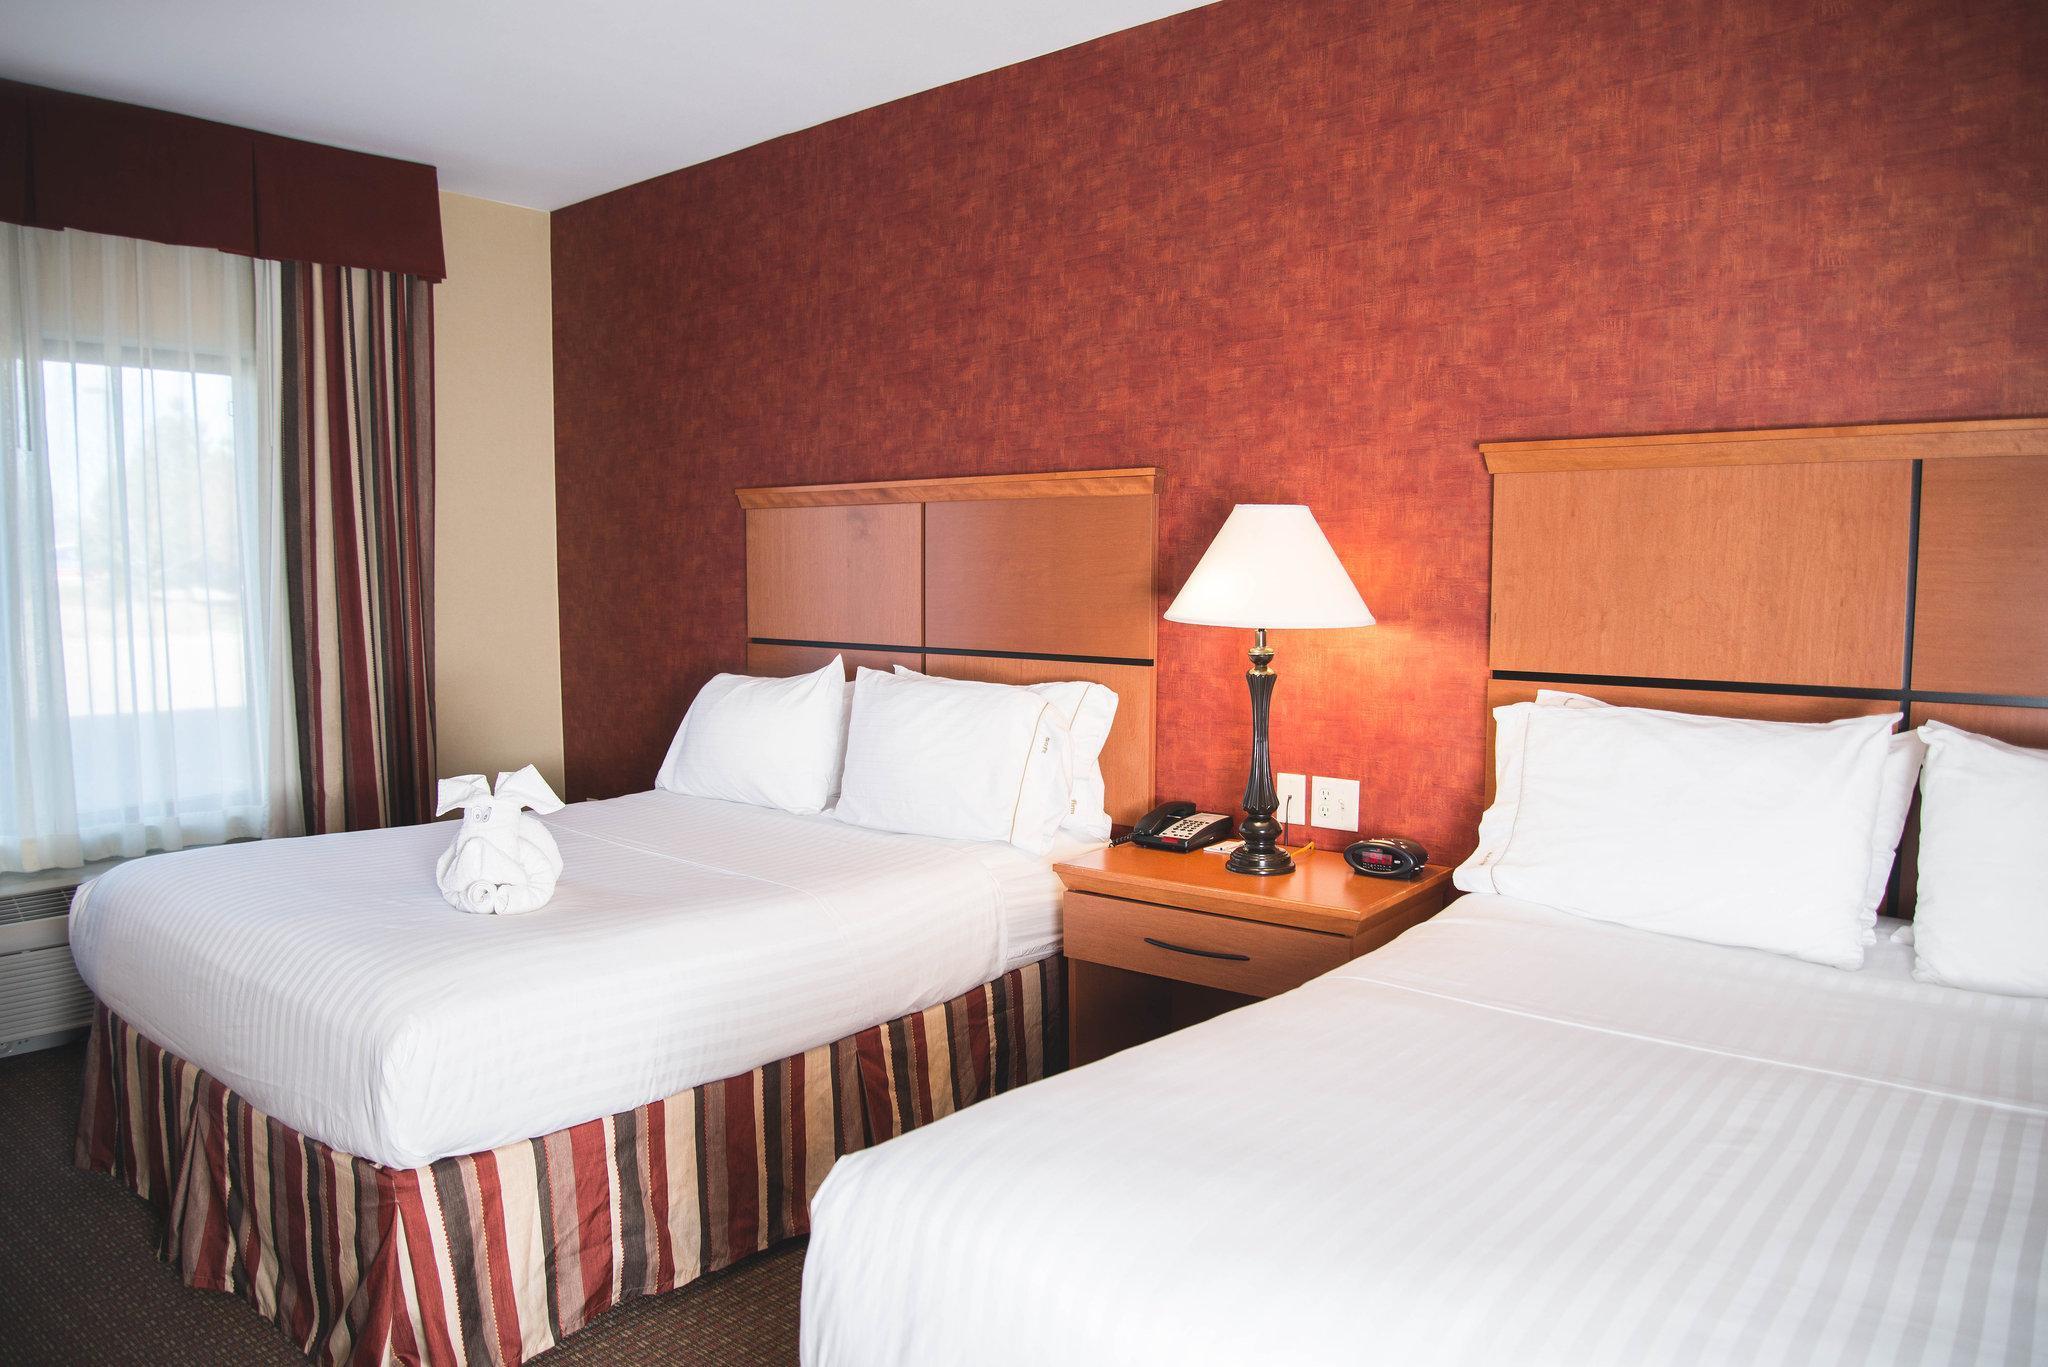 Holiday Inn Express Hotel Suites Loveland In Loveland Co